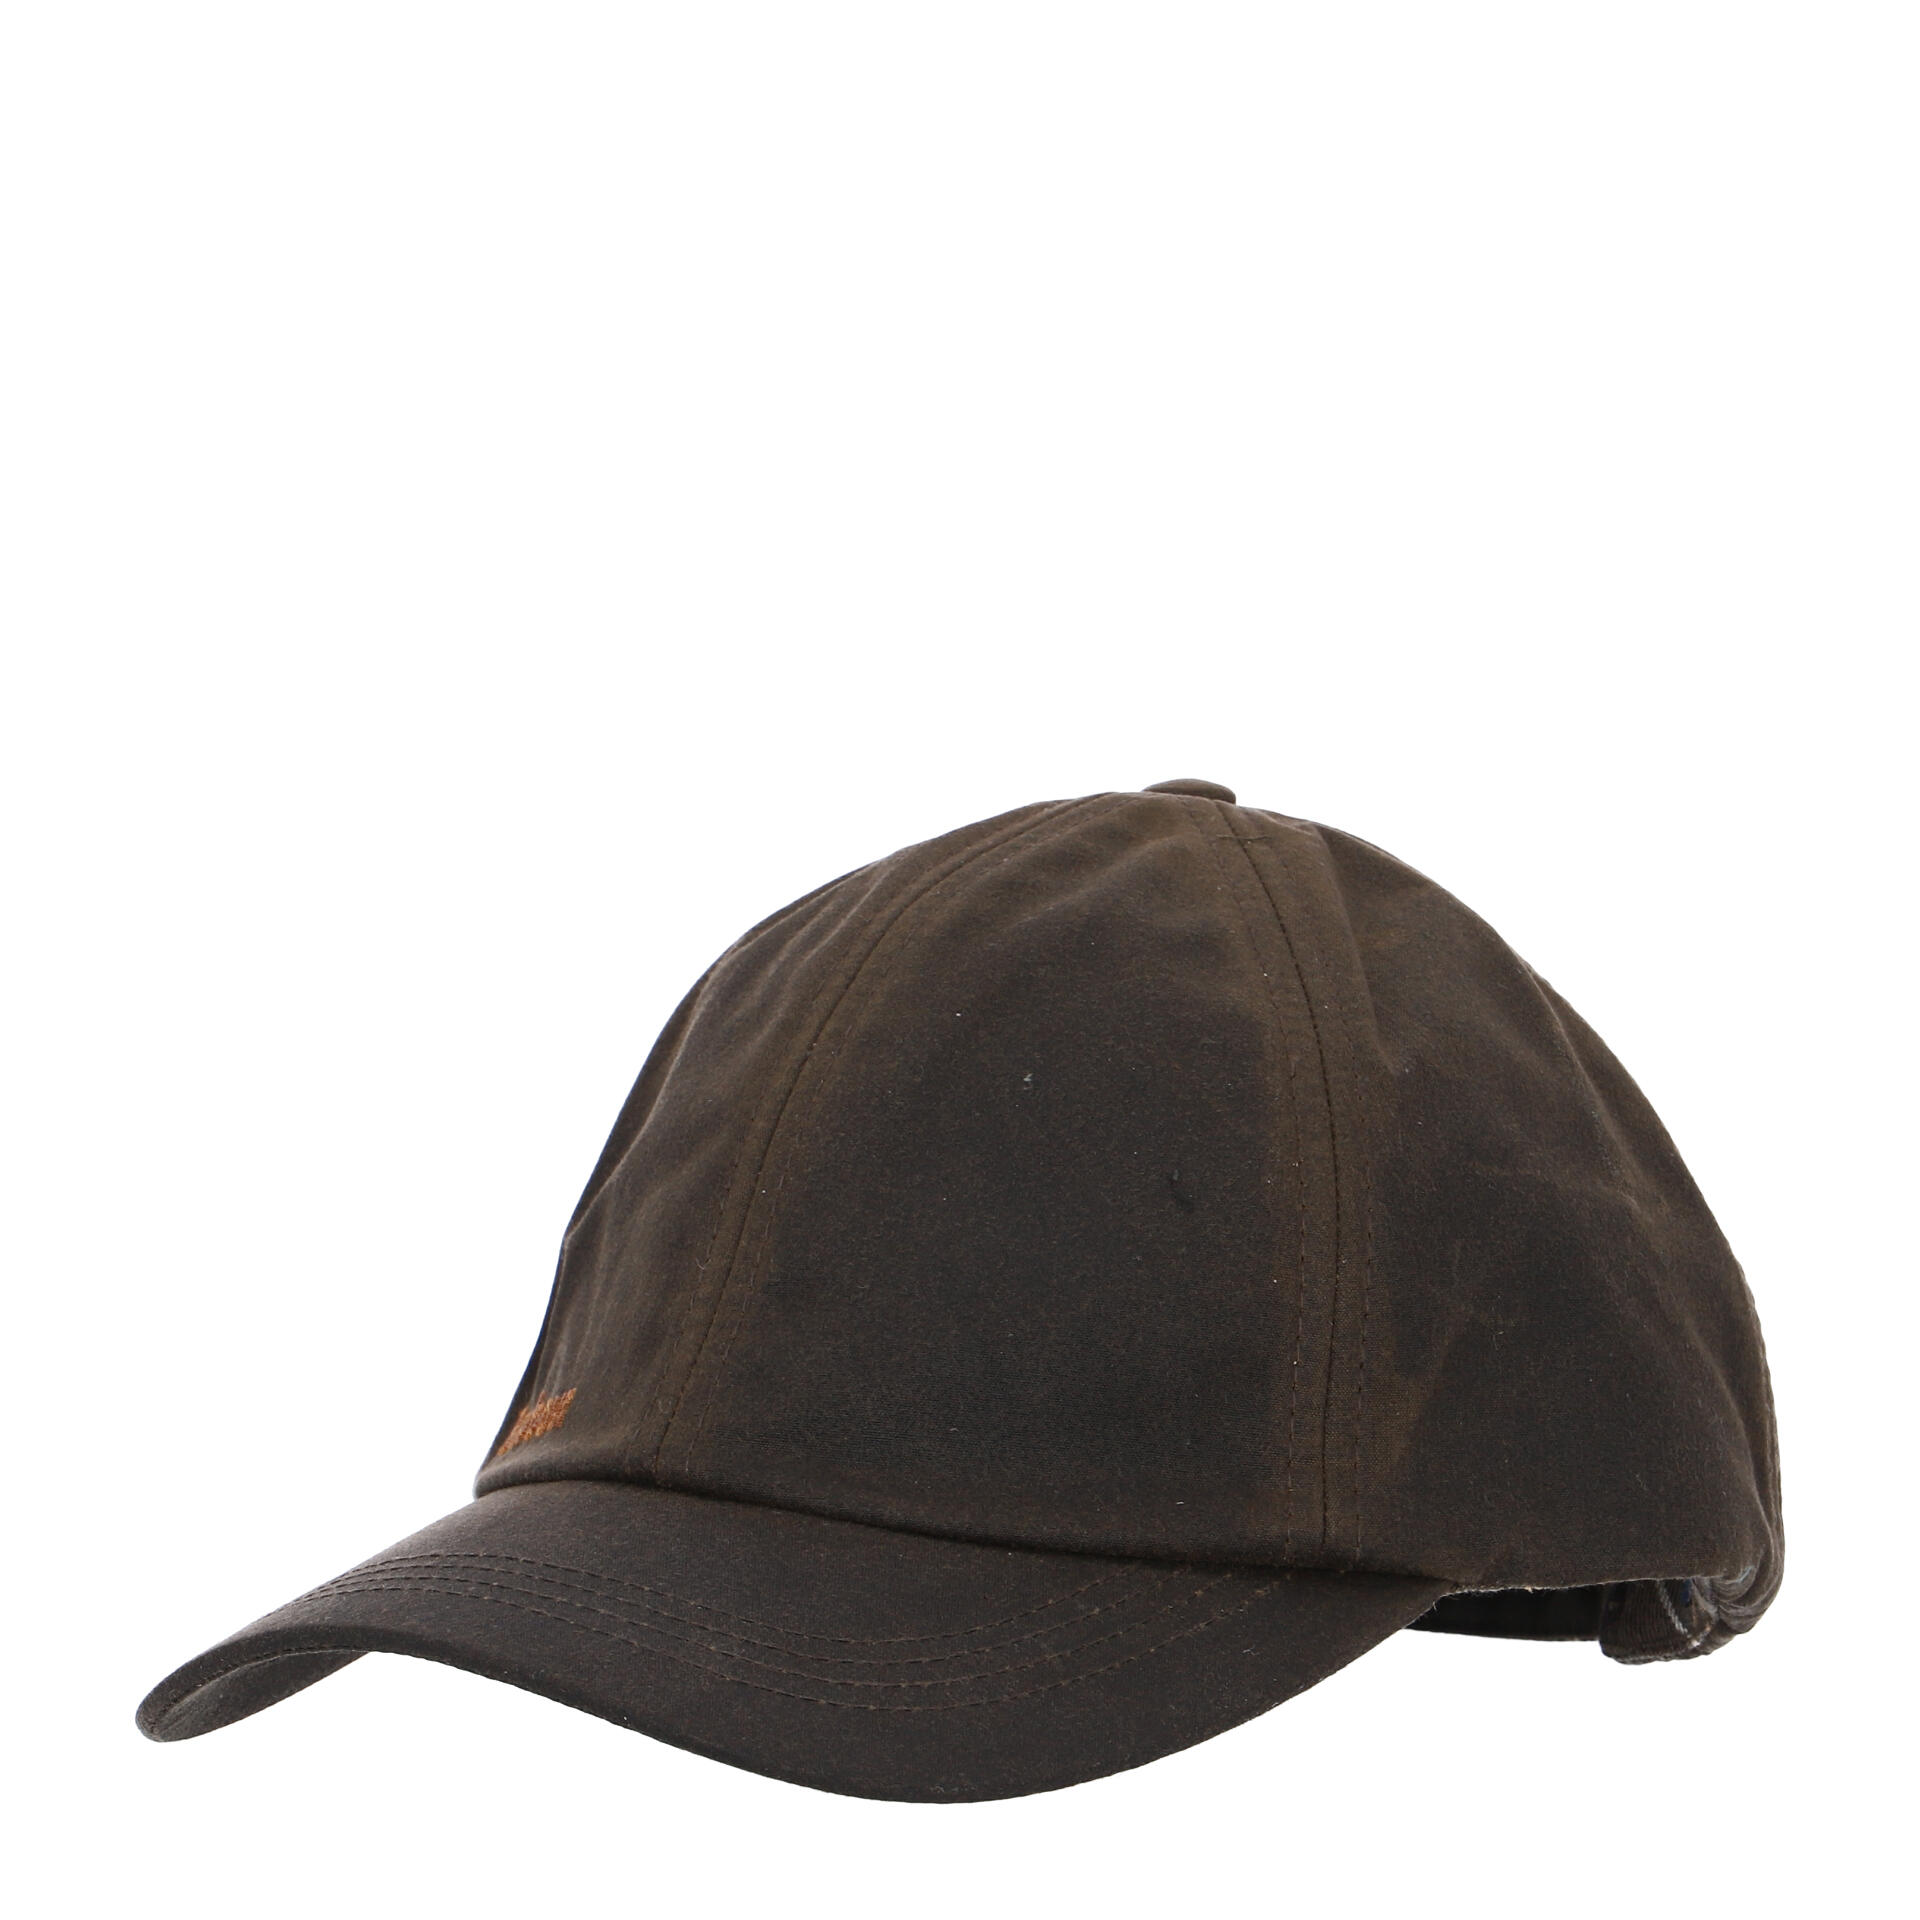 Prestbury Sports Cap olive